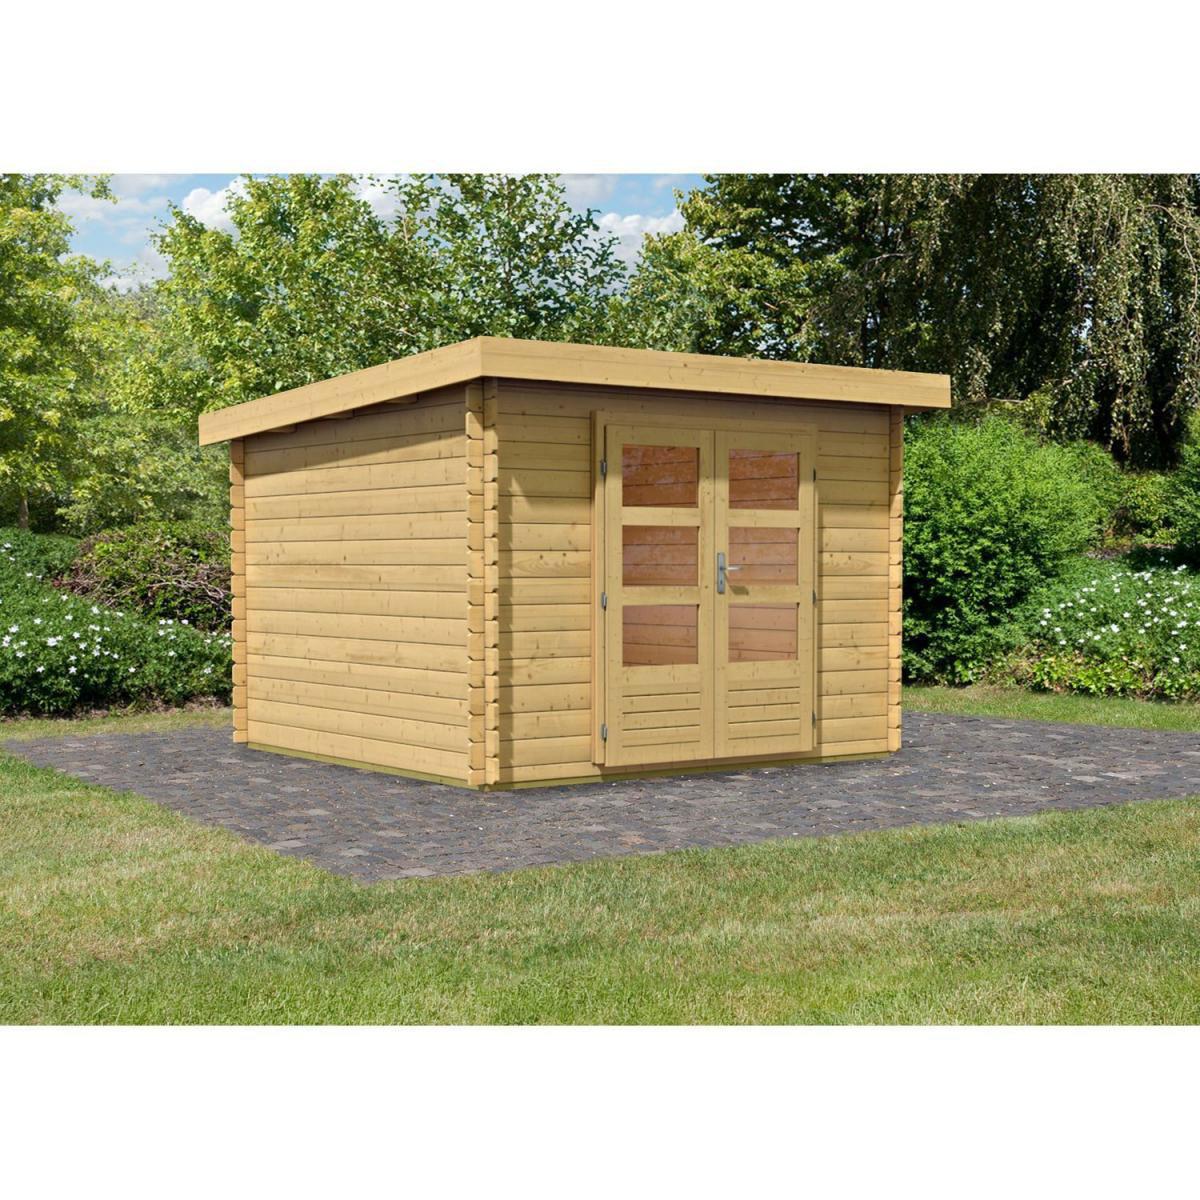 Woodfeeling Bastrup 5 Gartenhaus, naturbelassen